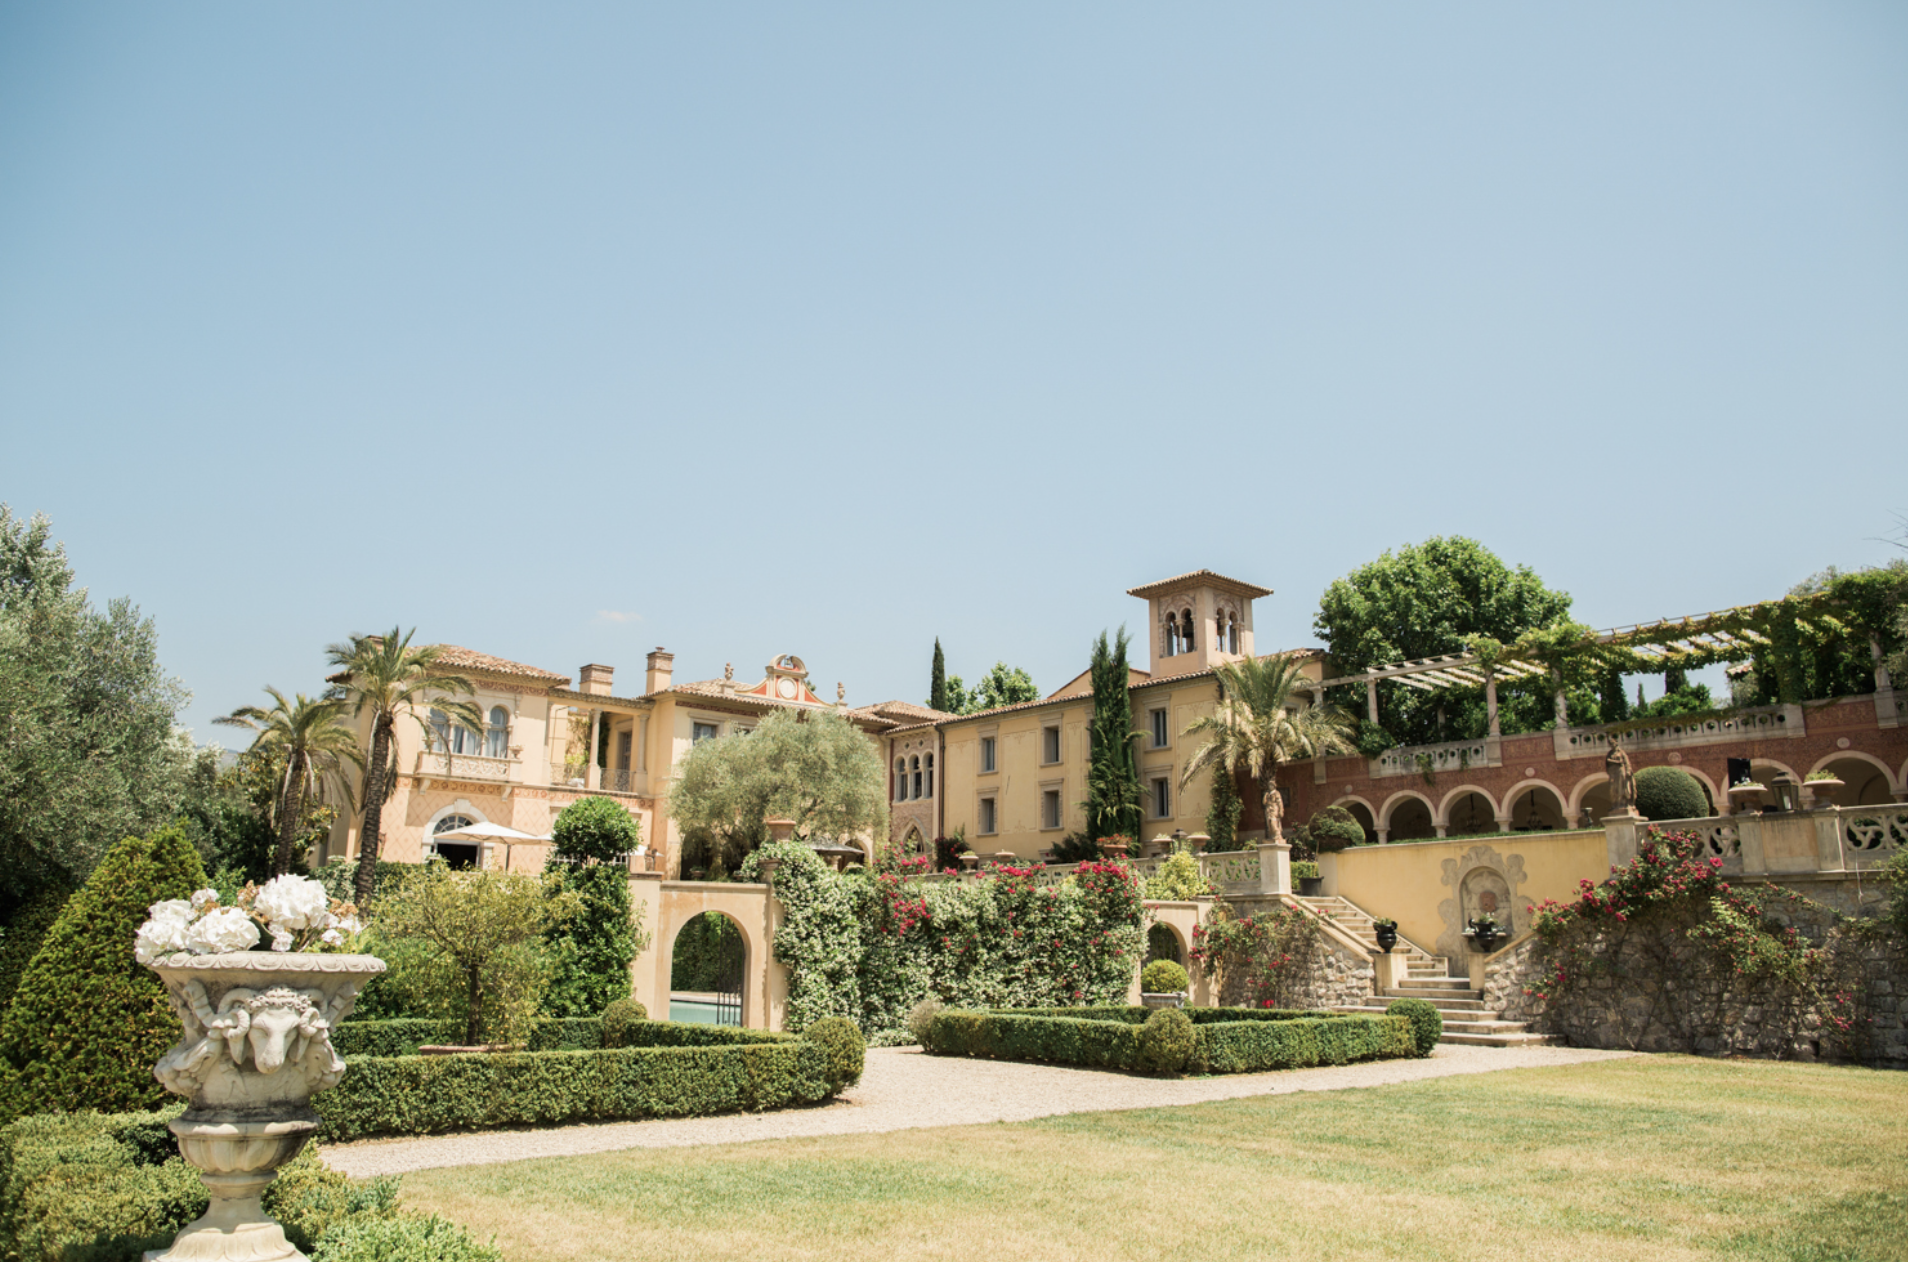 Luxury Wedding venue French Riviera with Muriel Saldalamacchia The International Wedding Planner